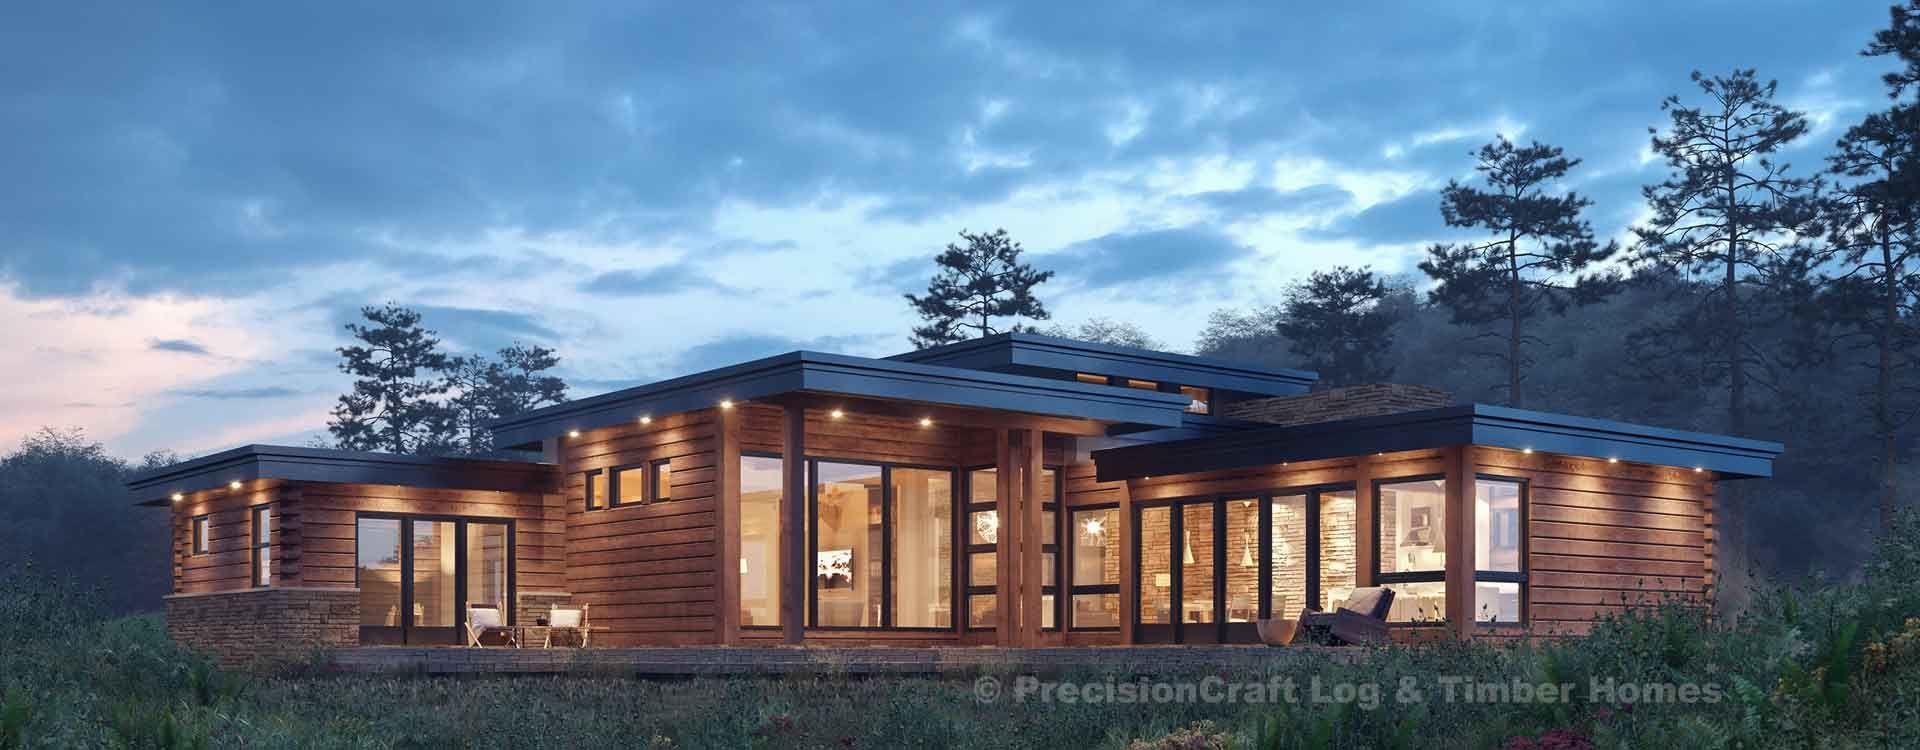 Sun Prairie Rendering Log Home Floor Plans Prairie Style Houses Log Cabin House Plans